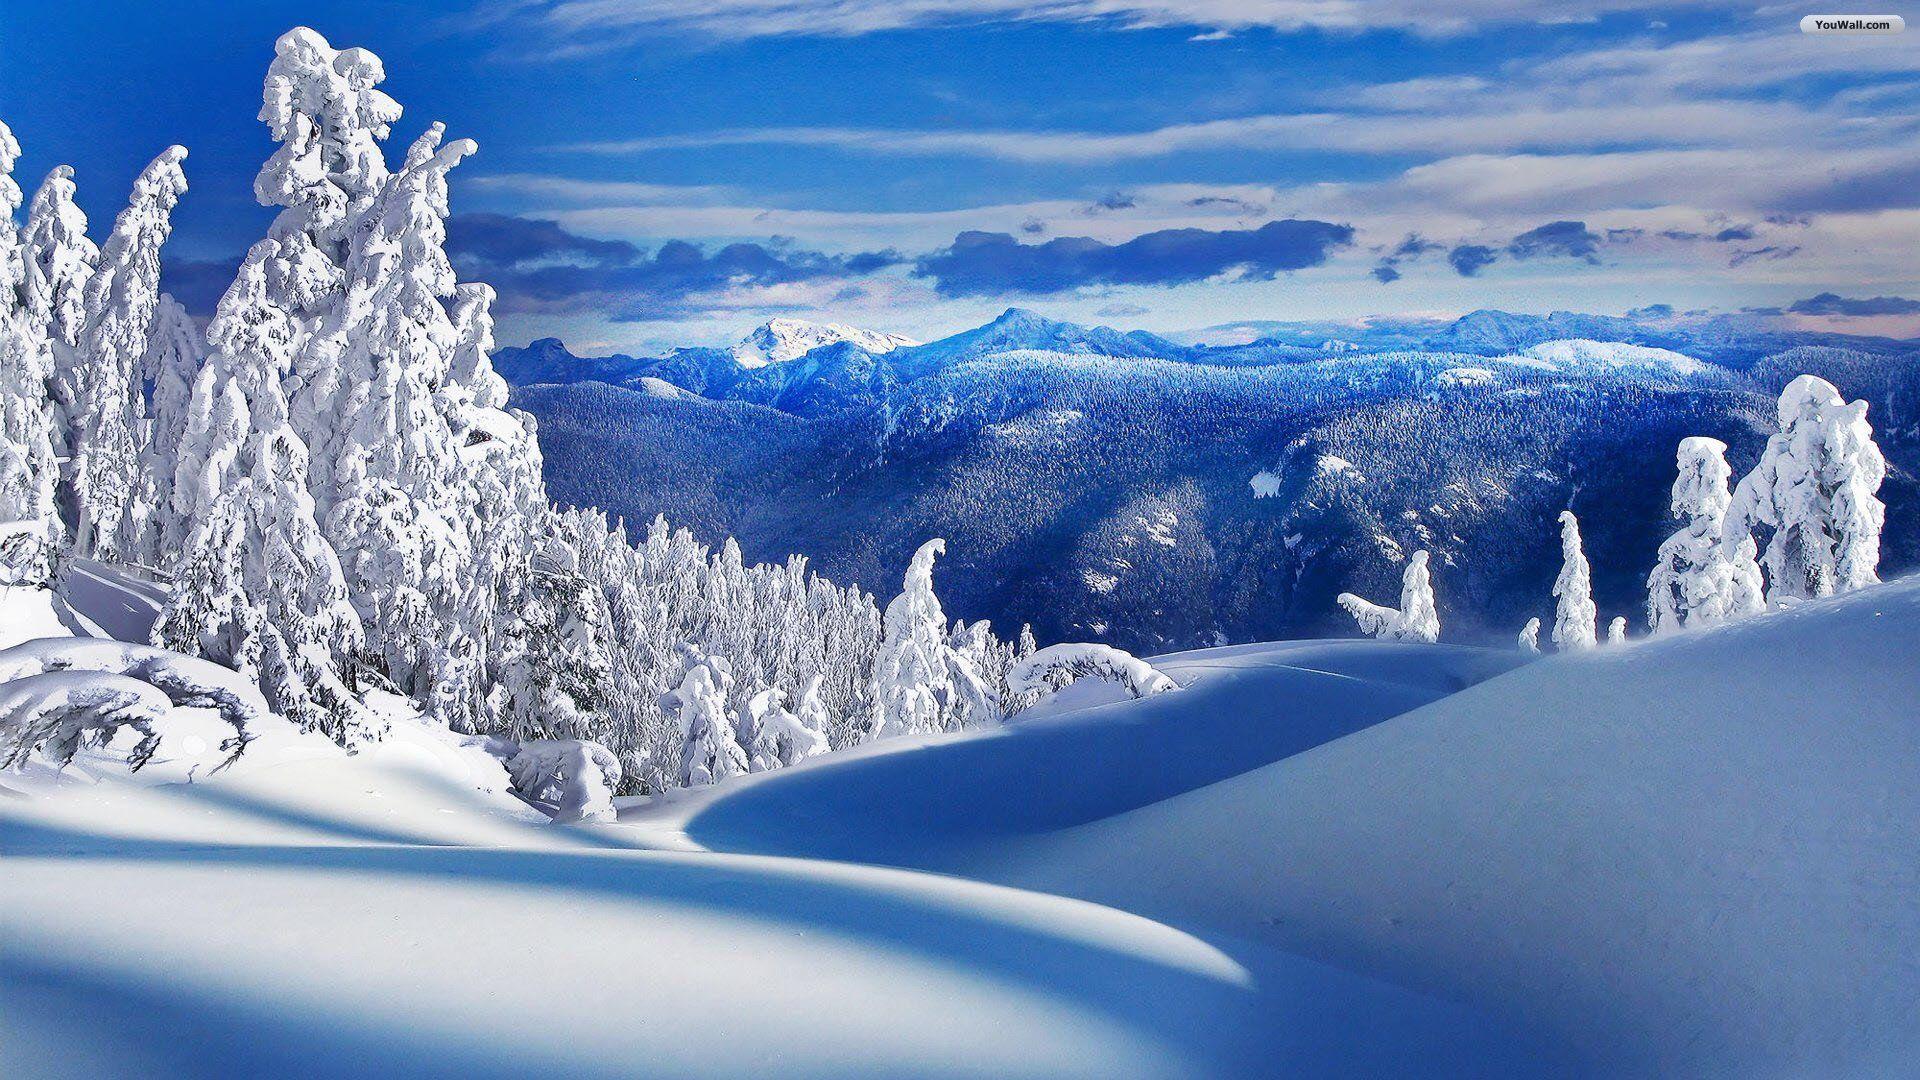 winter landscape wallpaper hd free landscapes and places